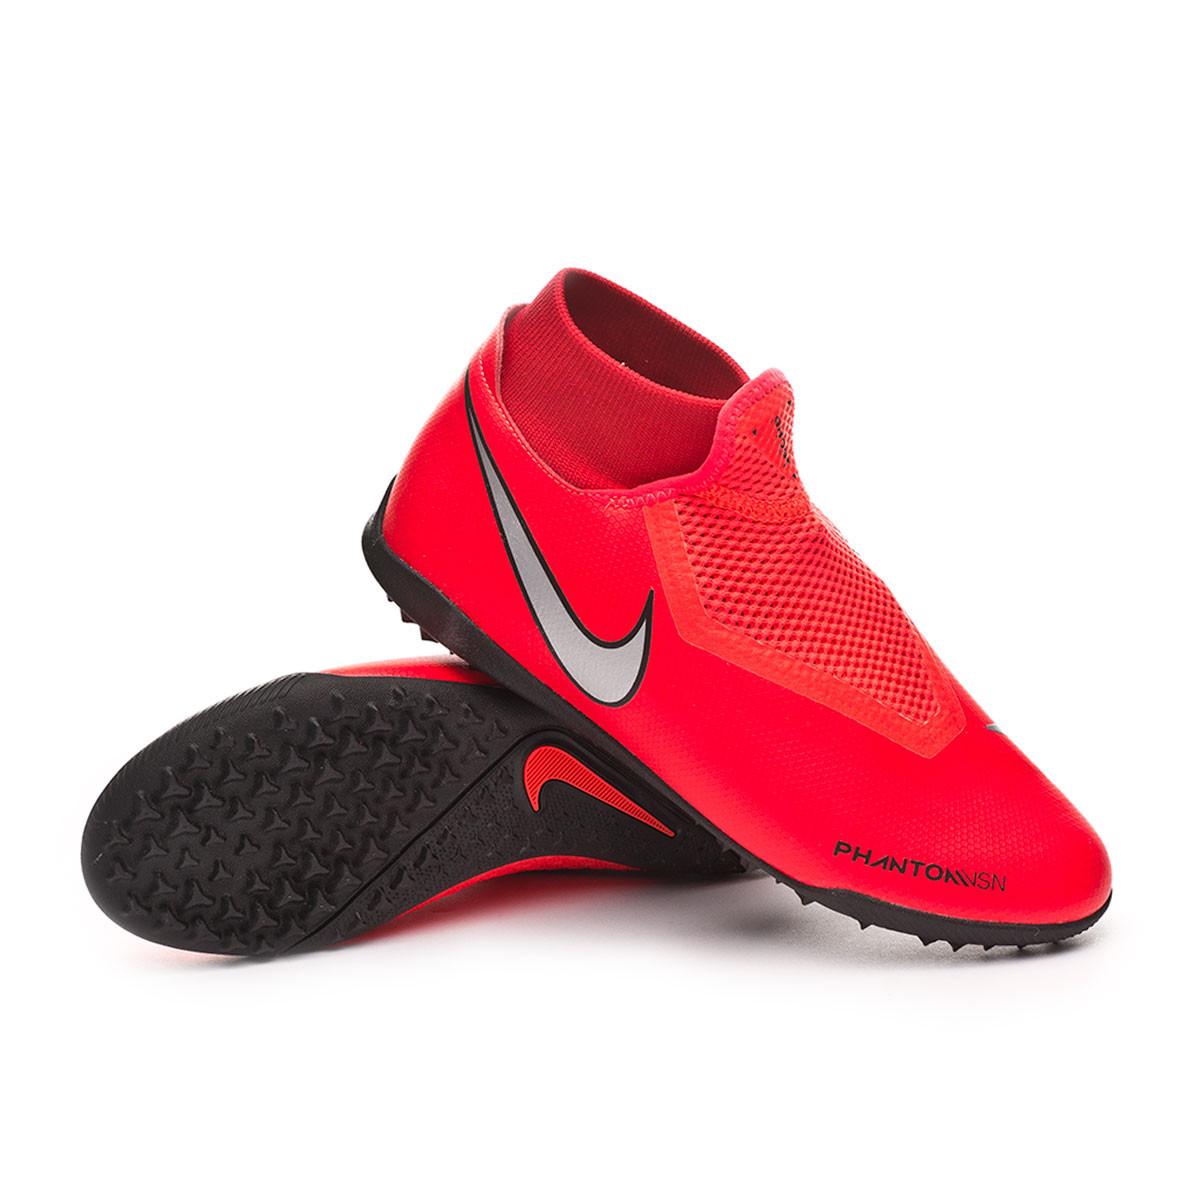 Football Boot Nike Phantom Vision